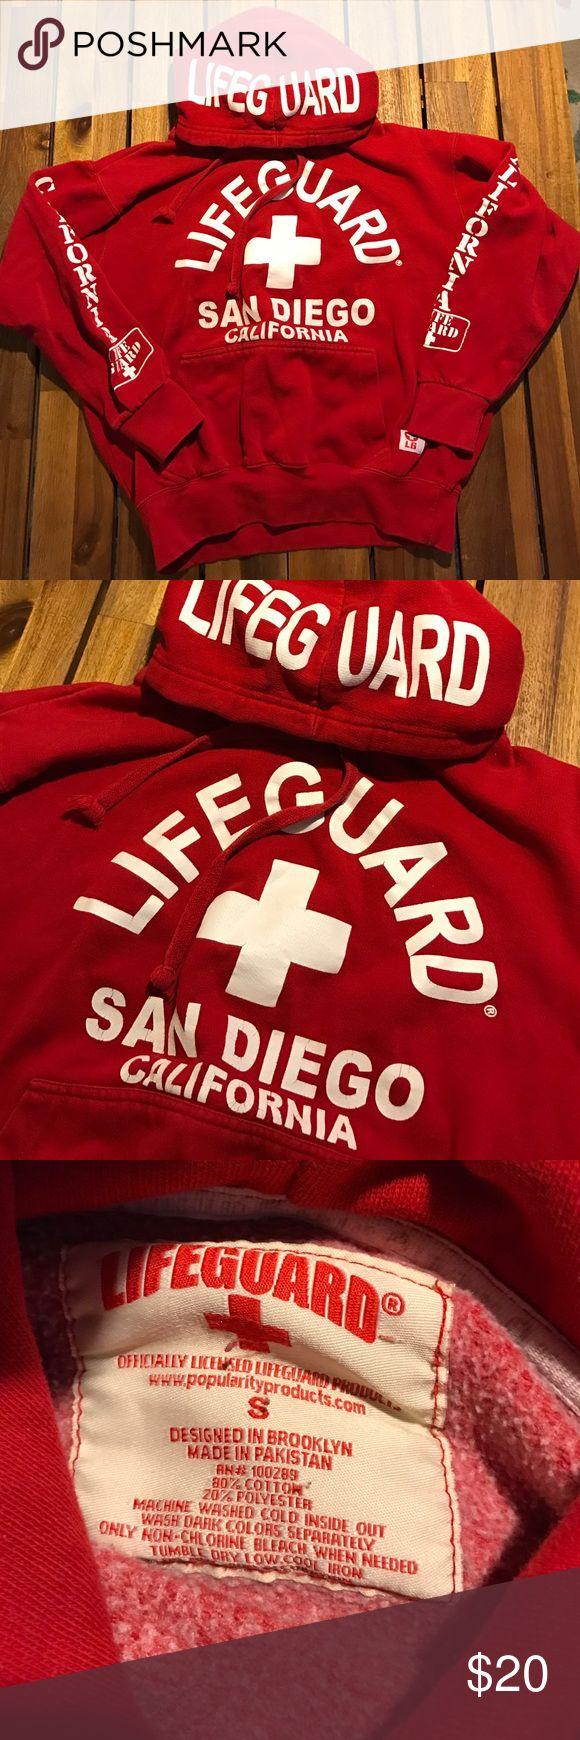 Life Guard Hoodie San Diego // Size S Tops Sweatshirts & Hoodies